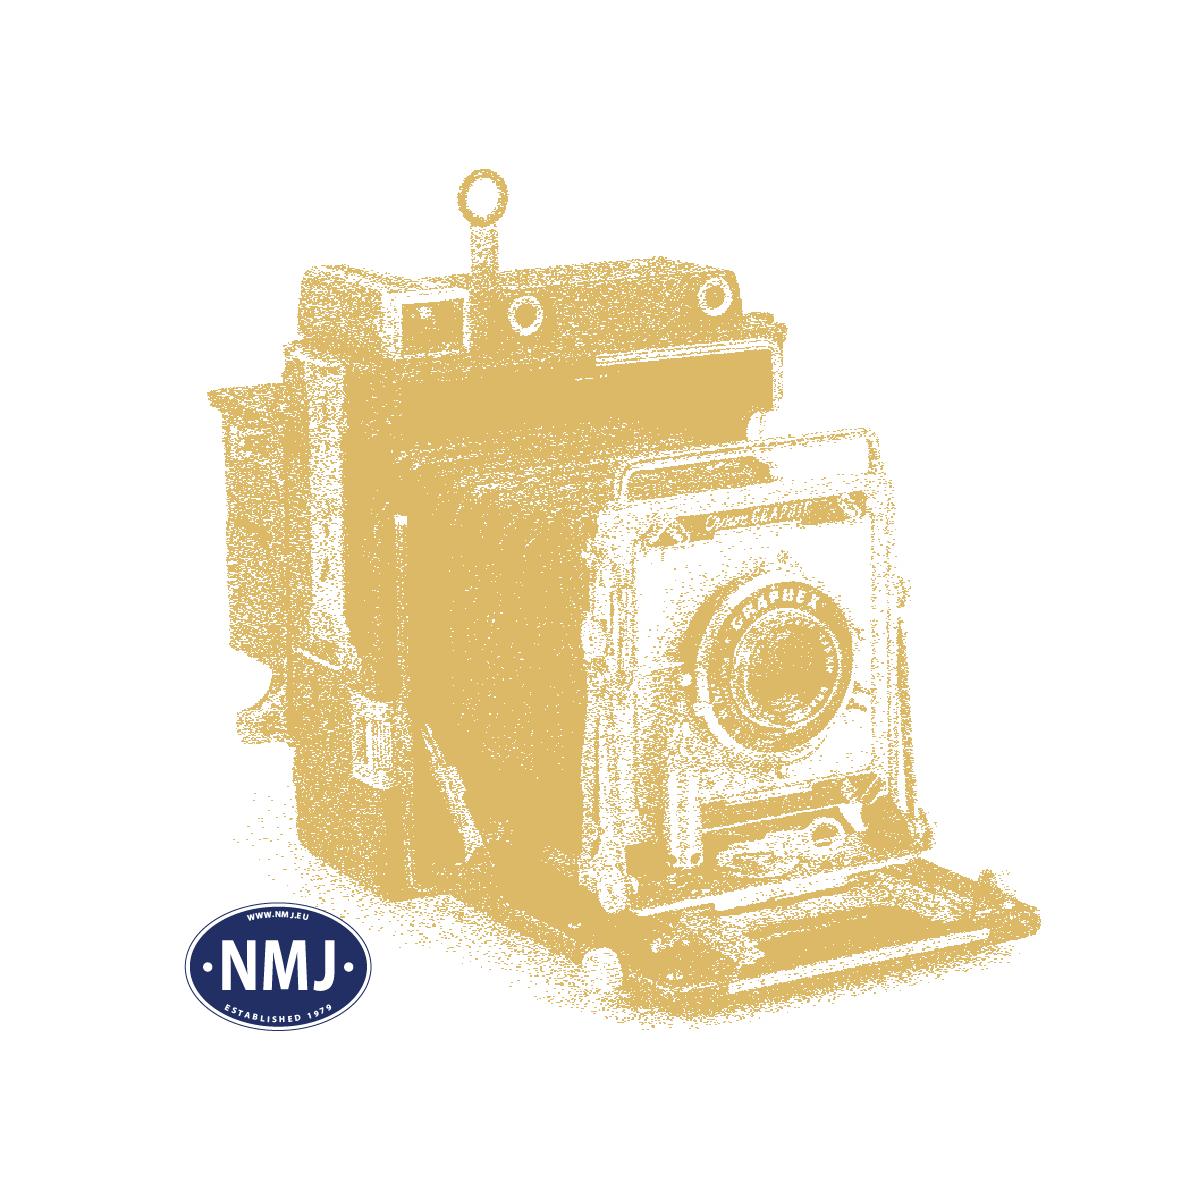 NMJT133.101 - NMJ Topline NSB BF10 21513, Gammeldesign, (rotbraun)